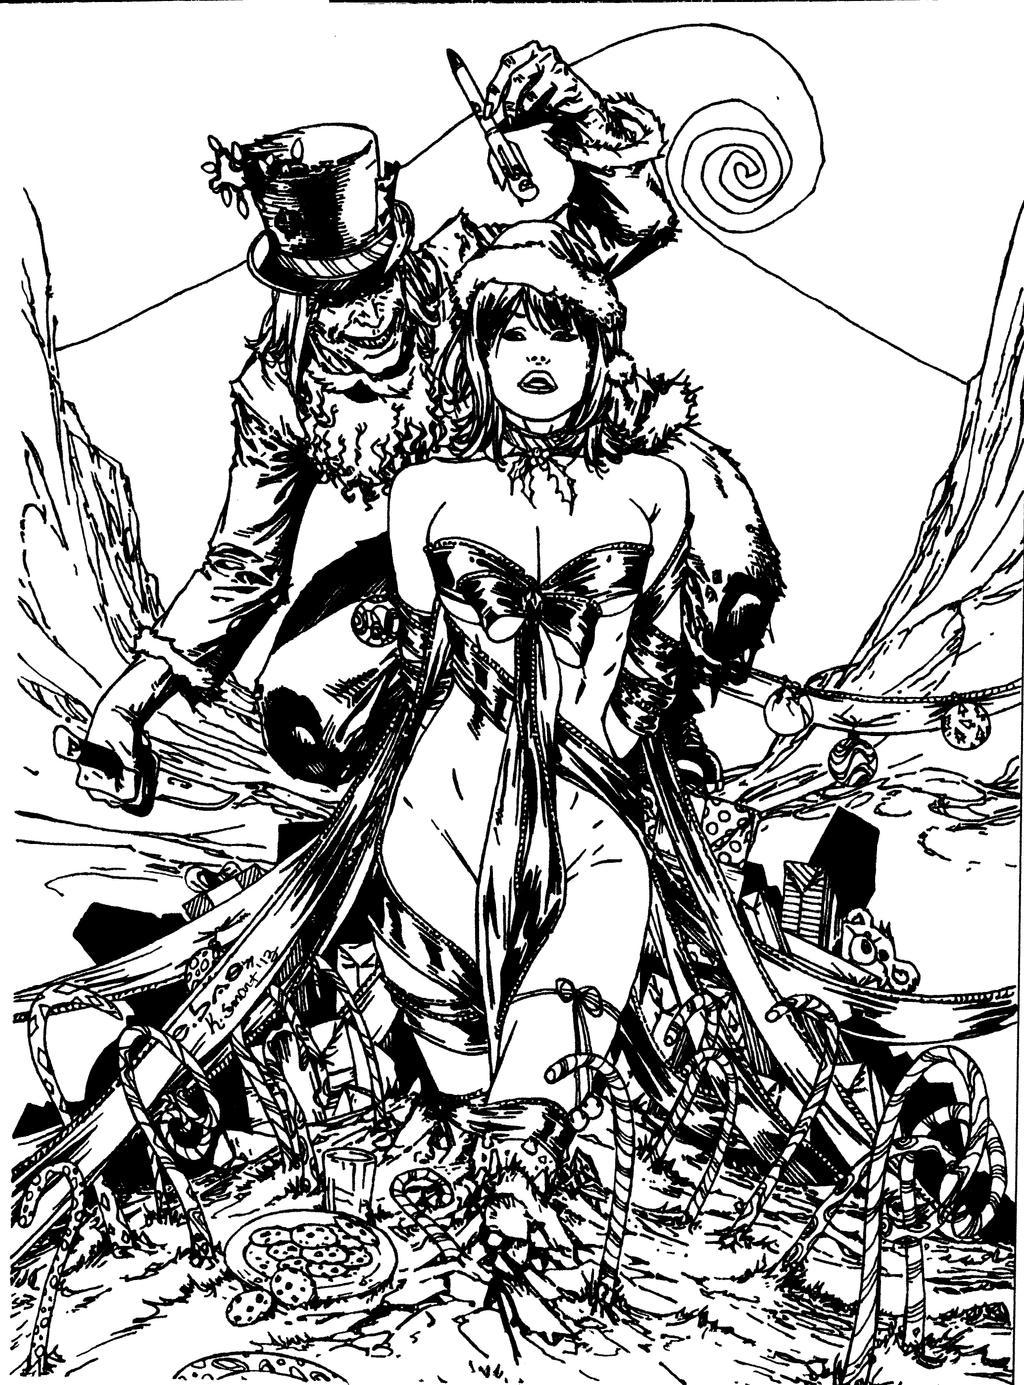 Grimm Fairy tales cover art by Ebas by kendiwan1987 on ...